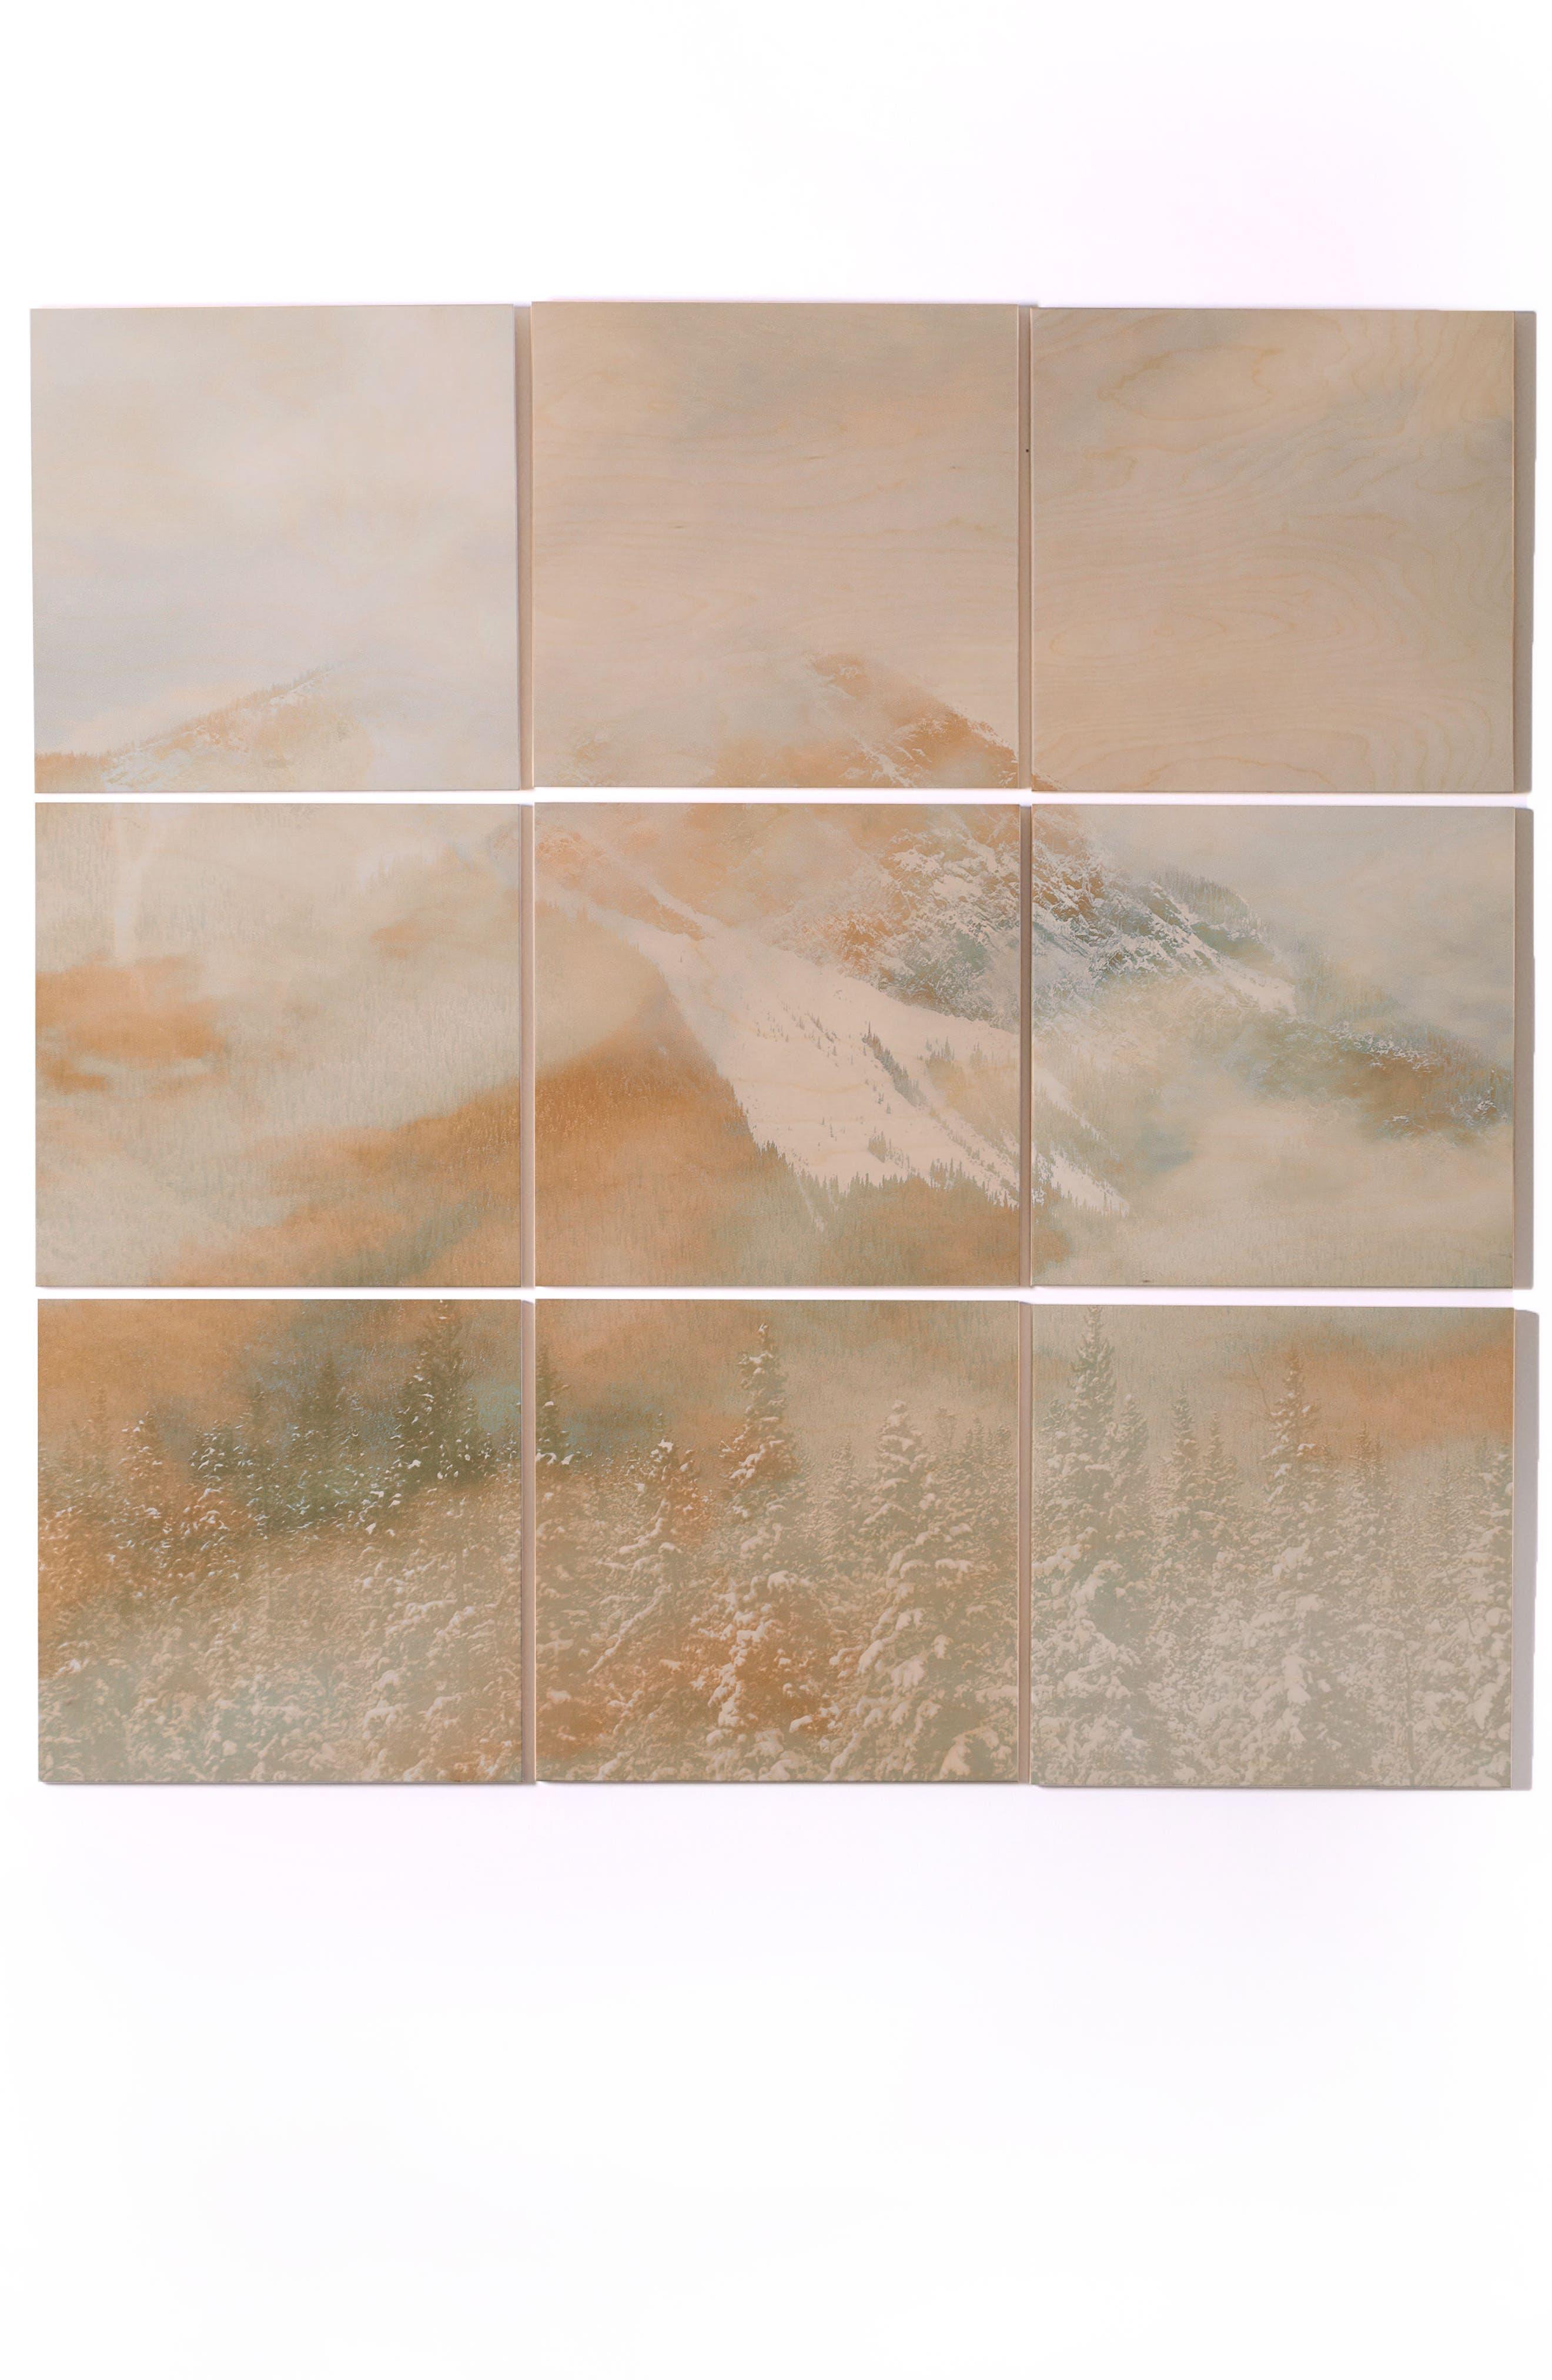 Golden Banff 9-Piece Wood Wall Mural,                             Main thumbnail 1, color,                             GRAY/ GOLD